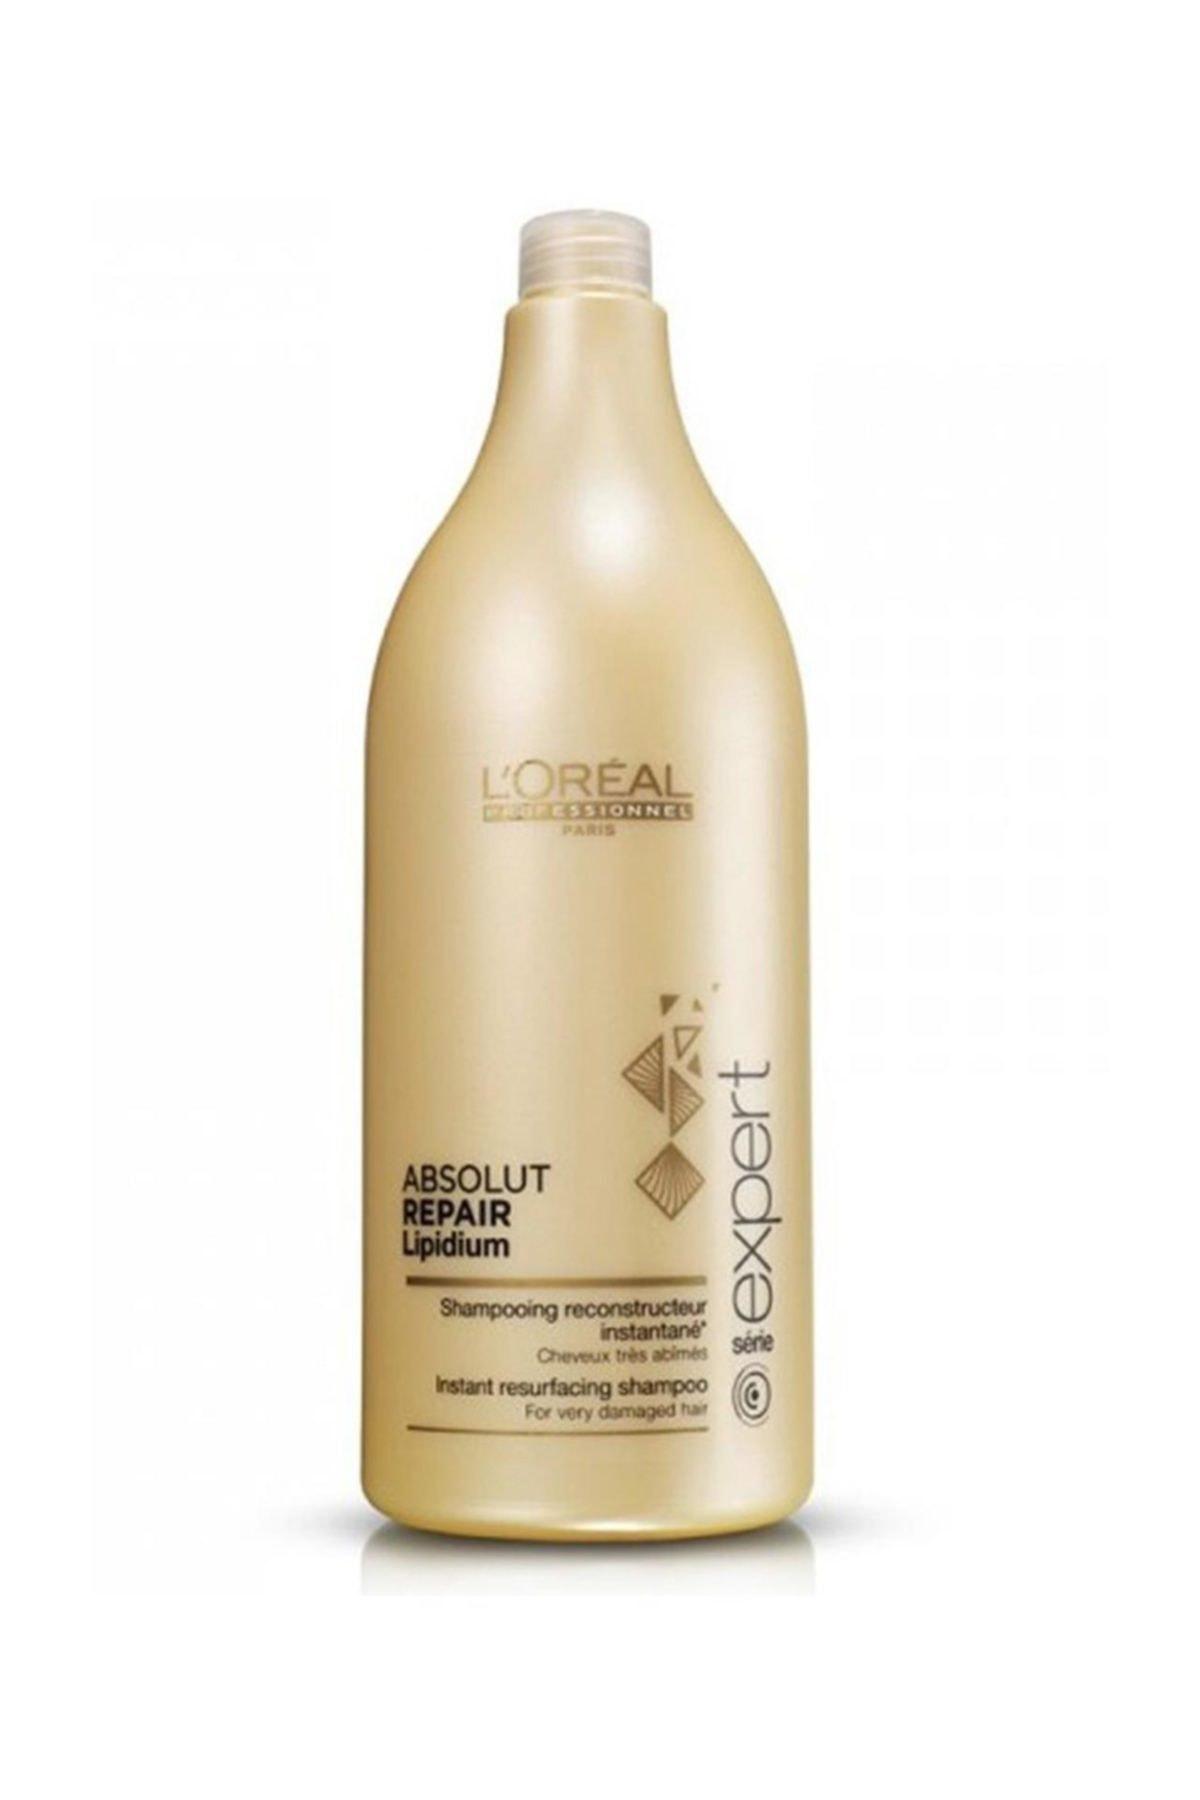 L'oreal Professionnel Absolut Repair Yıpranmış Saç Şampuan 1500 ml 1